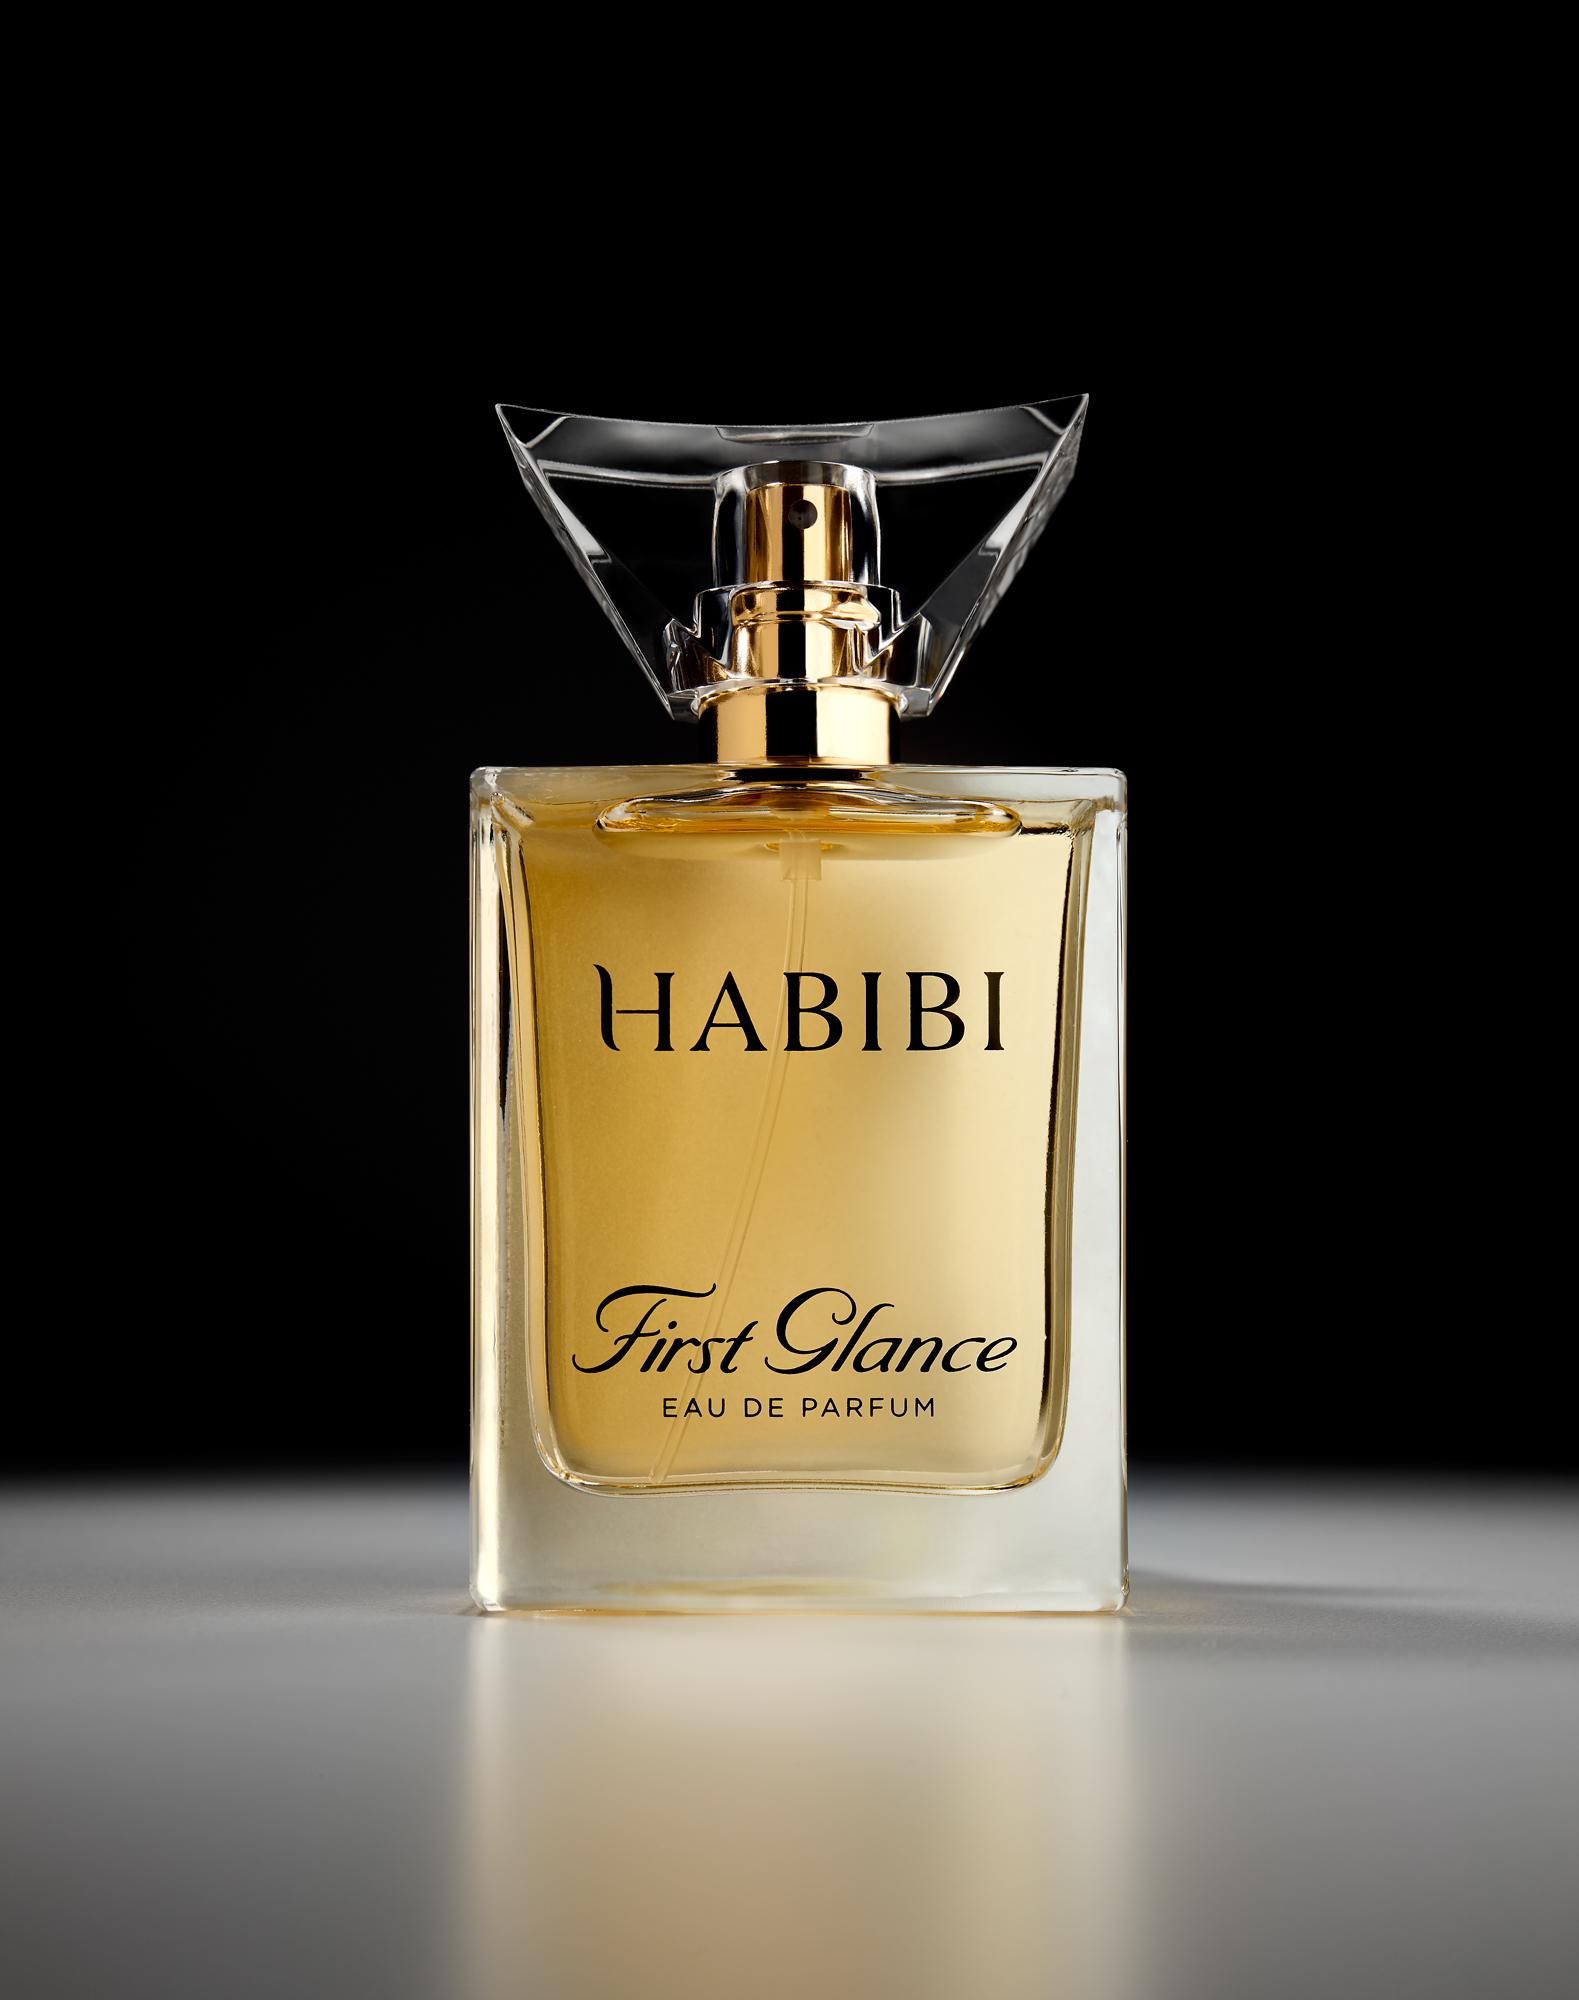 Image Result For Habibi